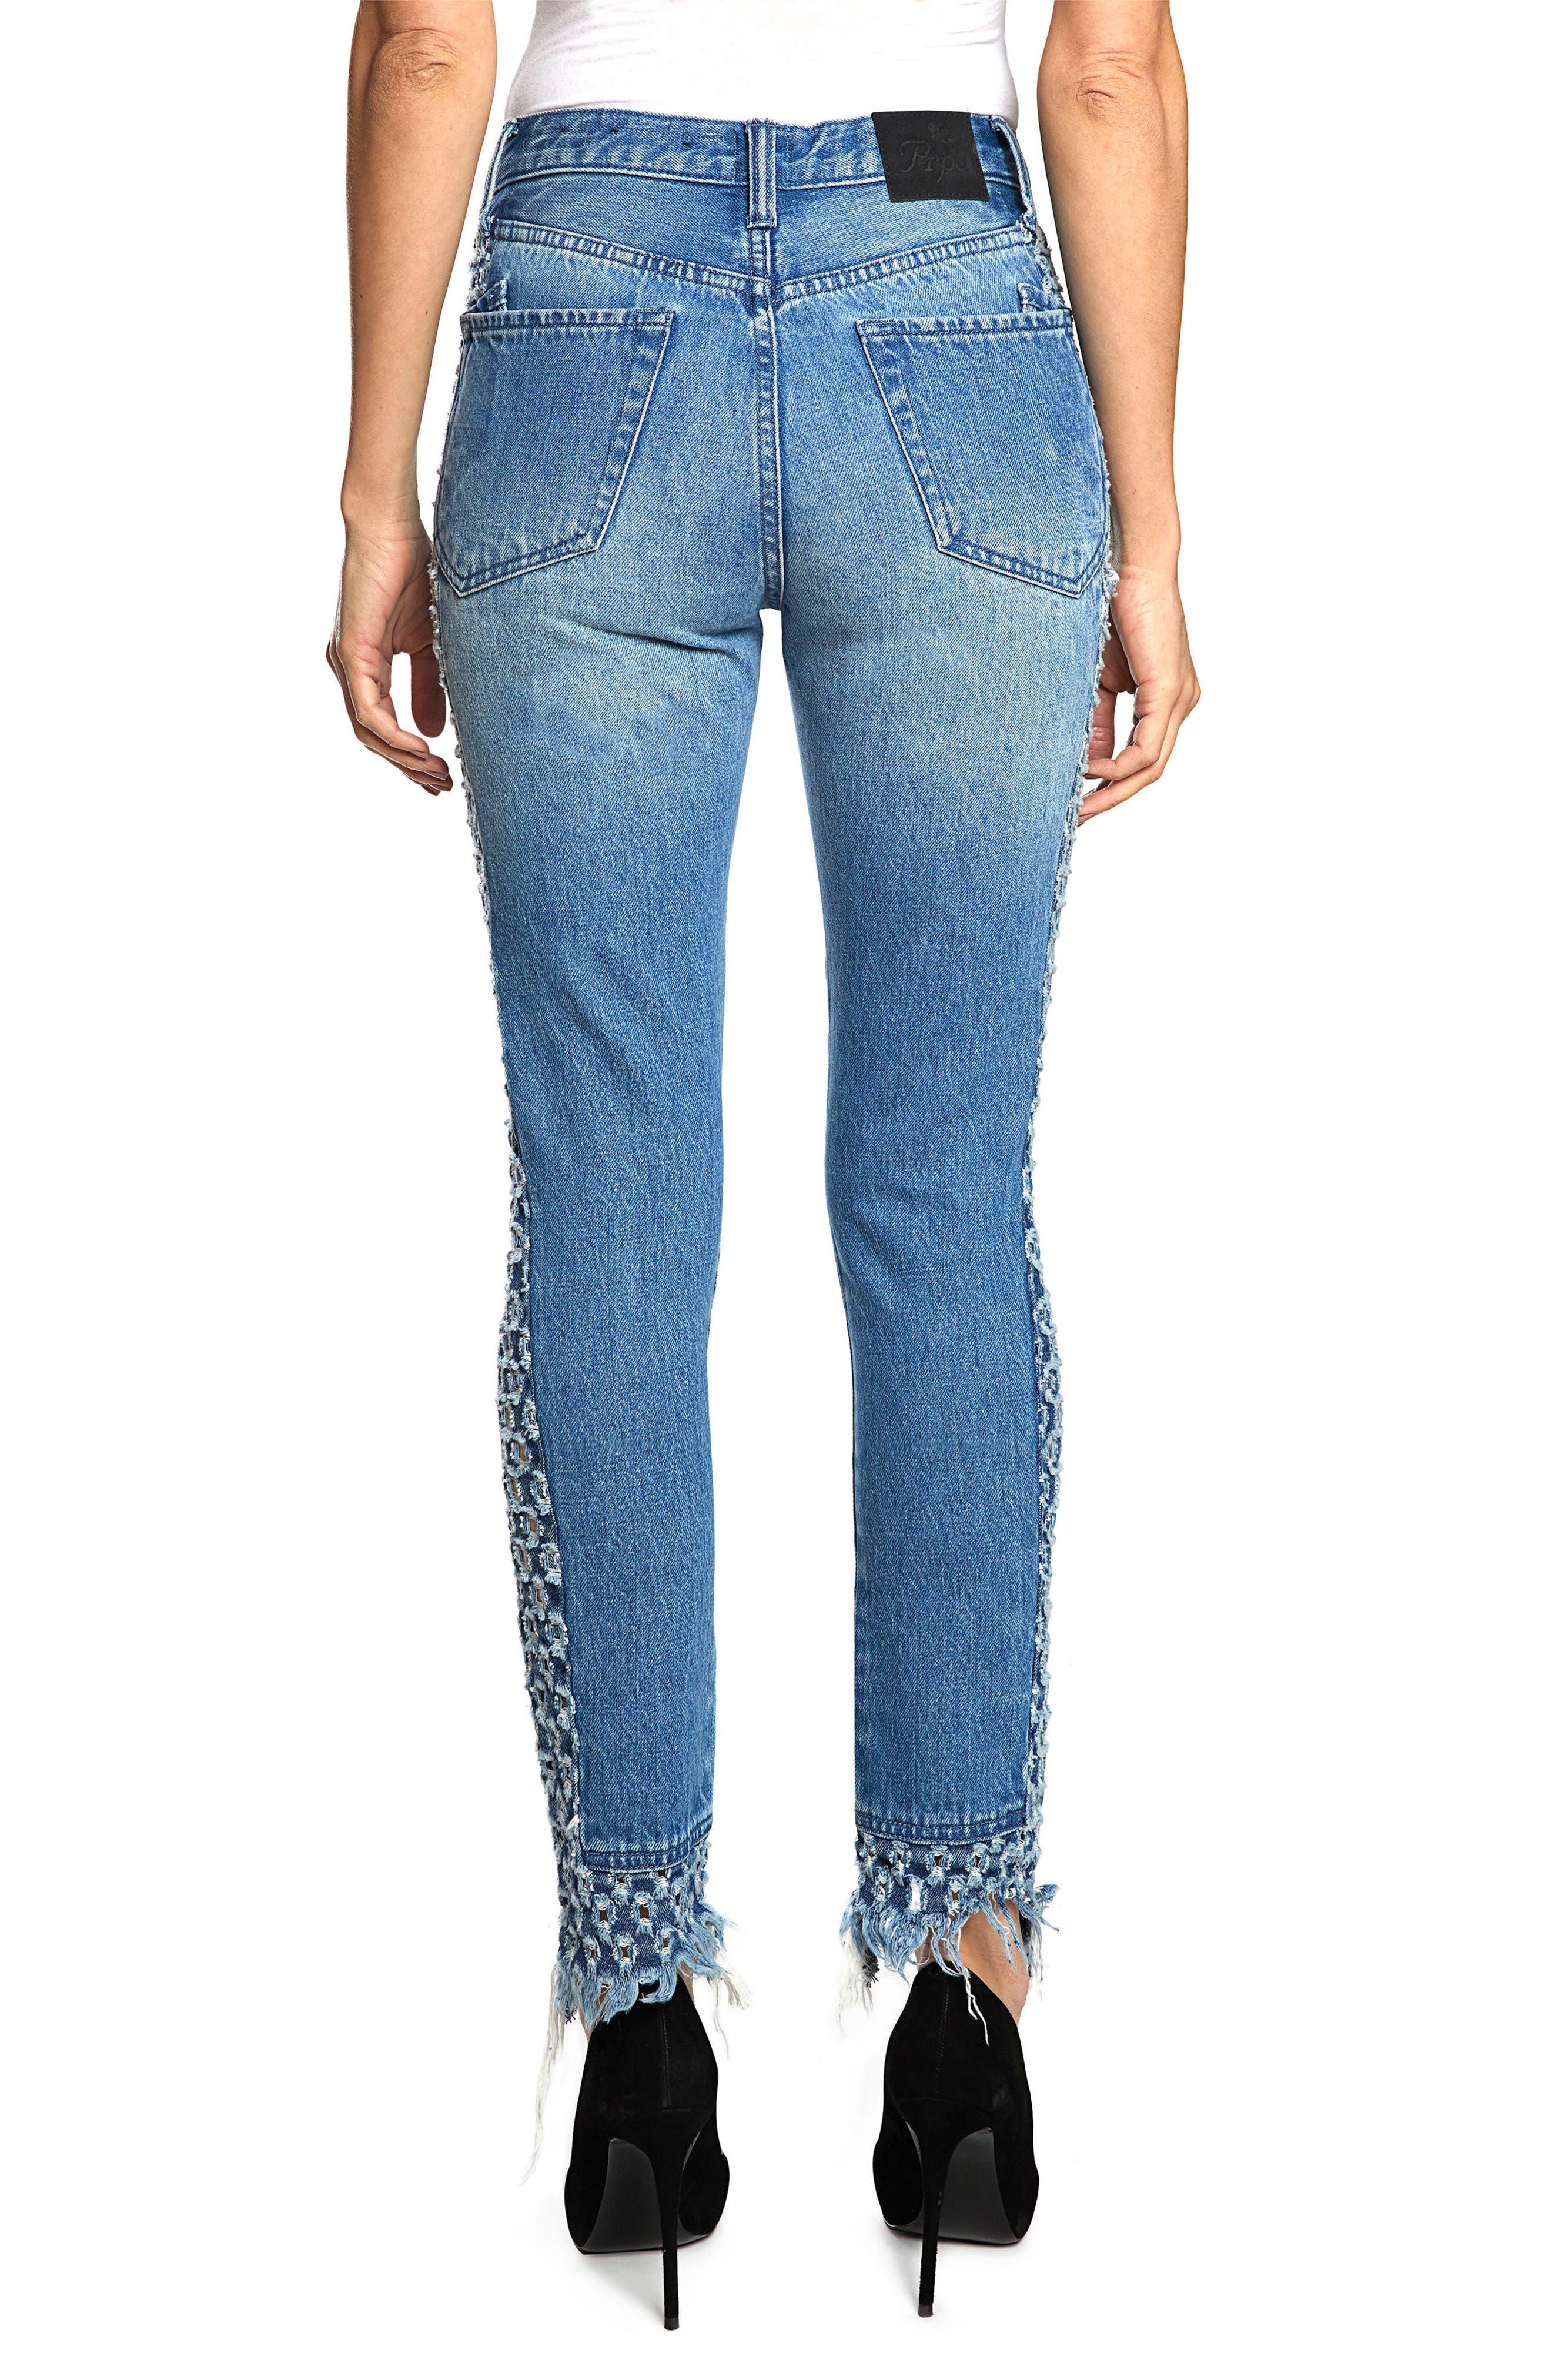 AMX Cutout Side Fray Hem Ankle Jeans,                             Alternate thumbnail 2, color,                             LIGHT STONE